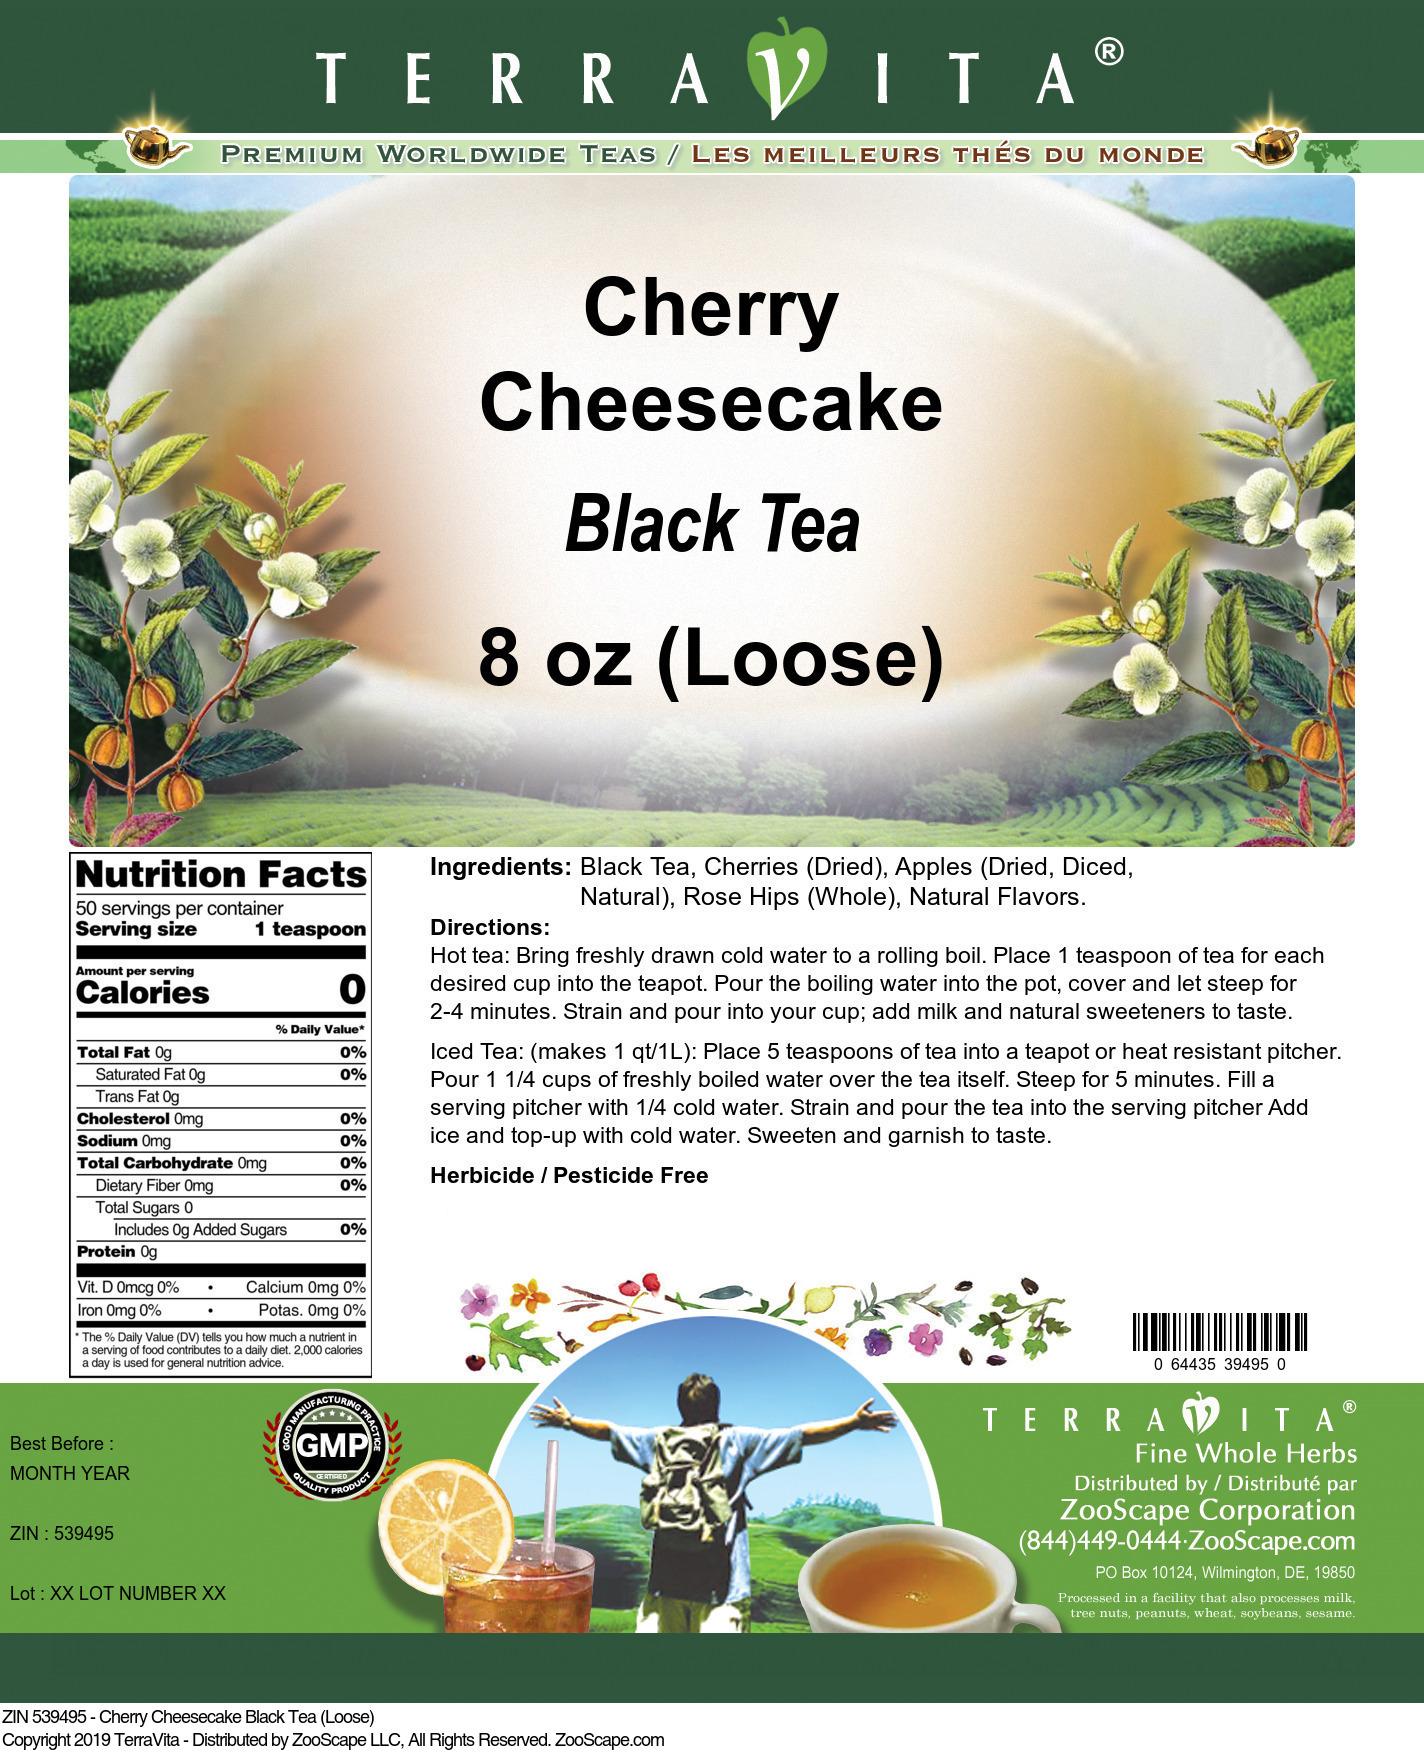 Cherry Cheesecake Black Tea